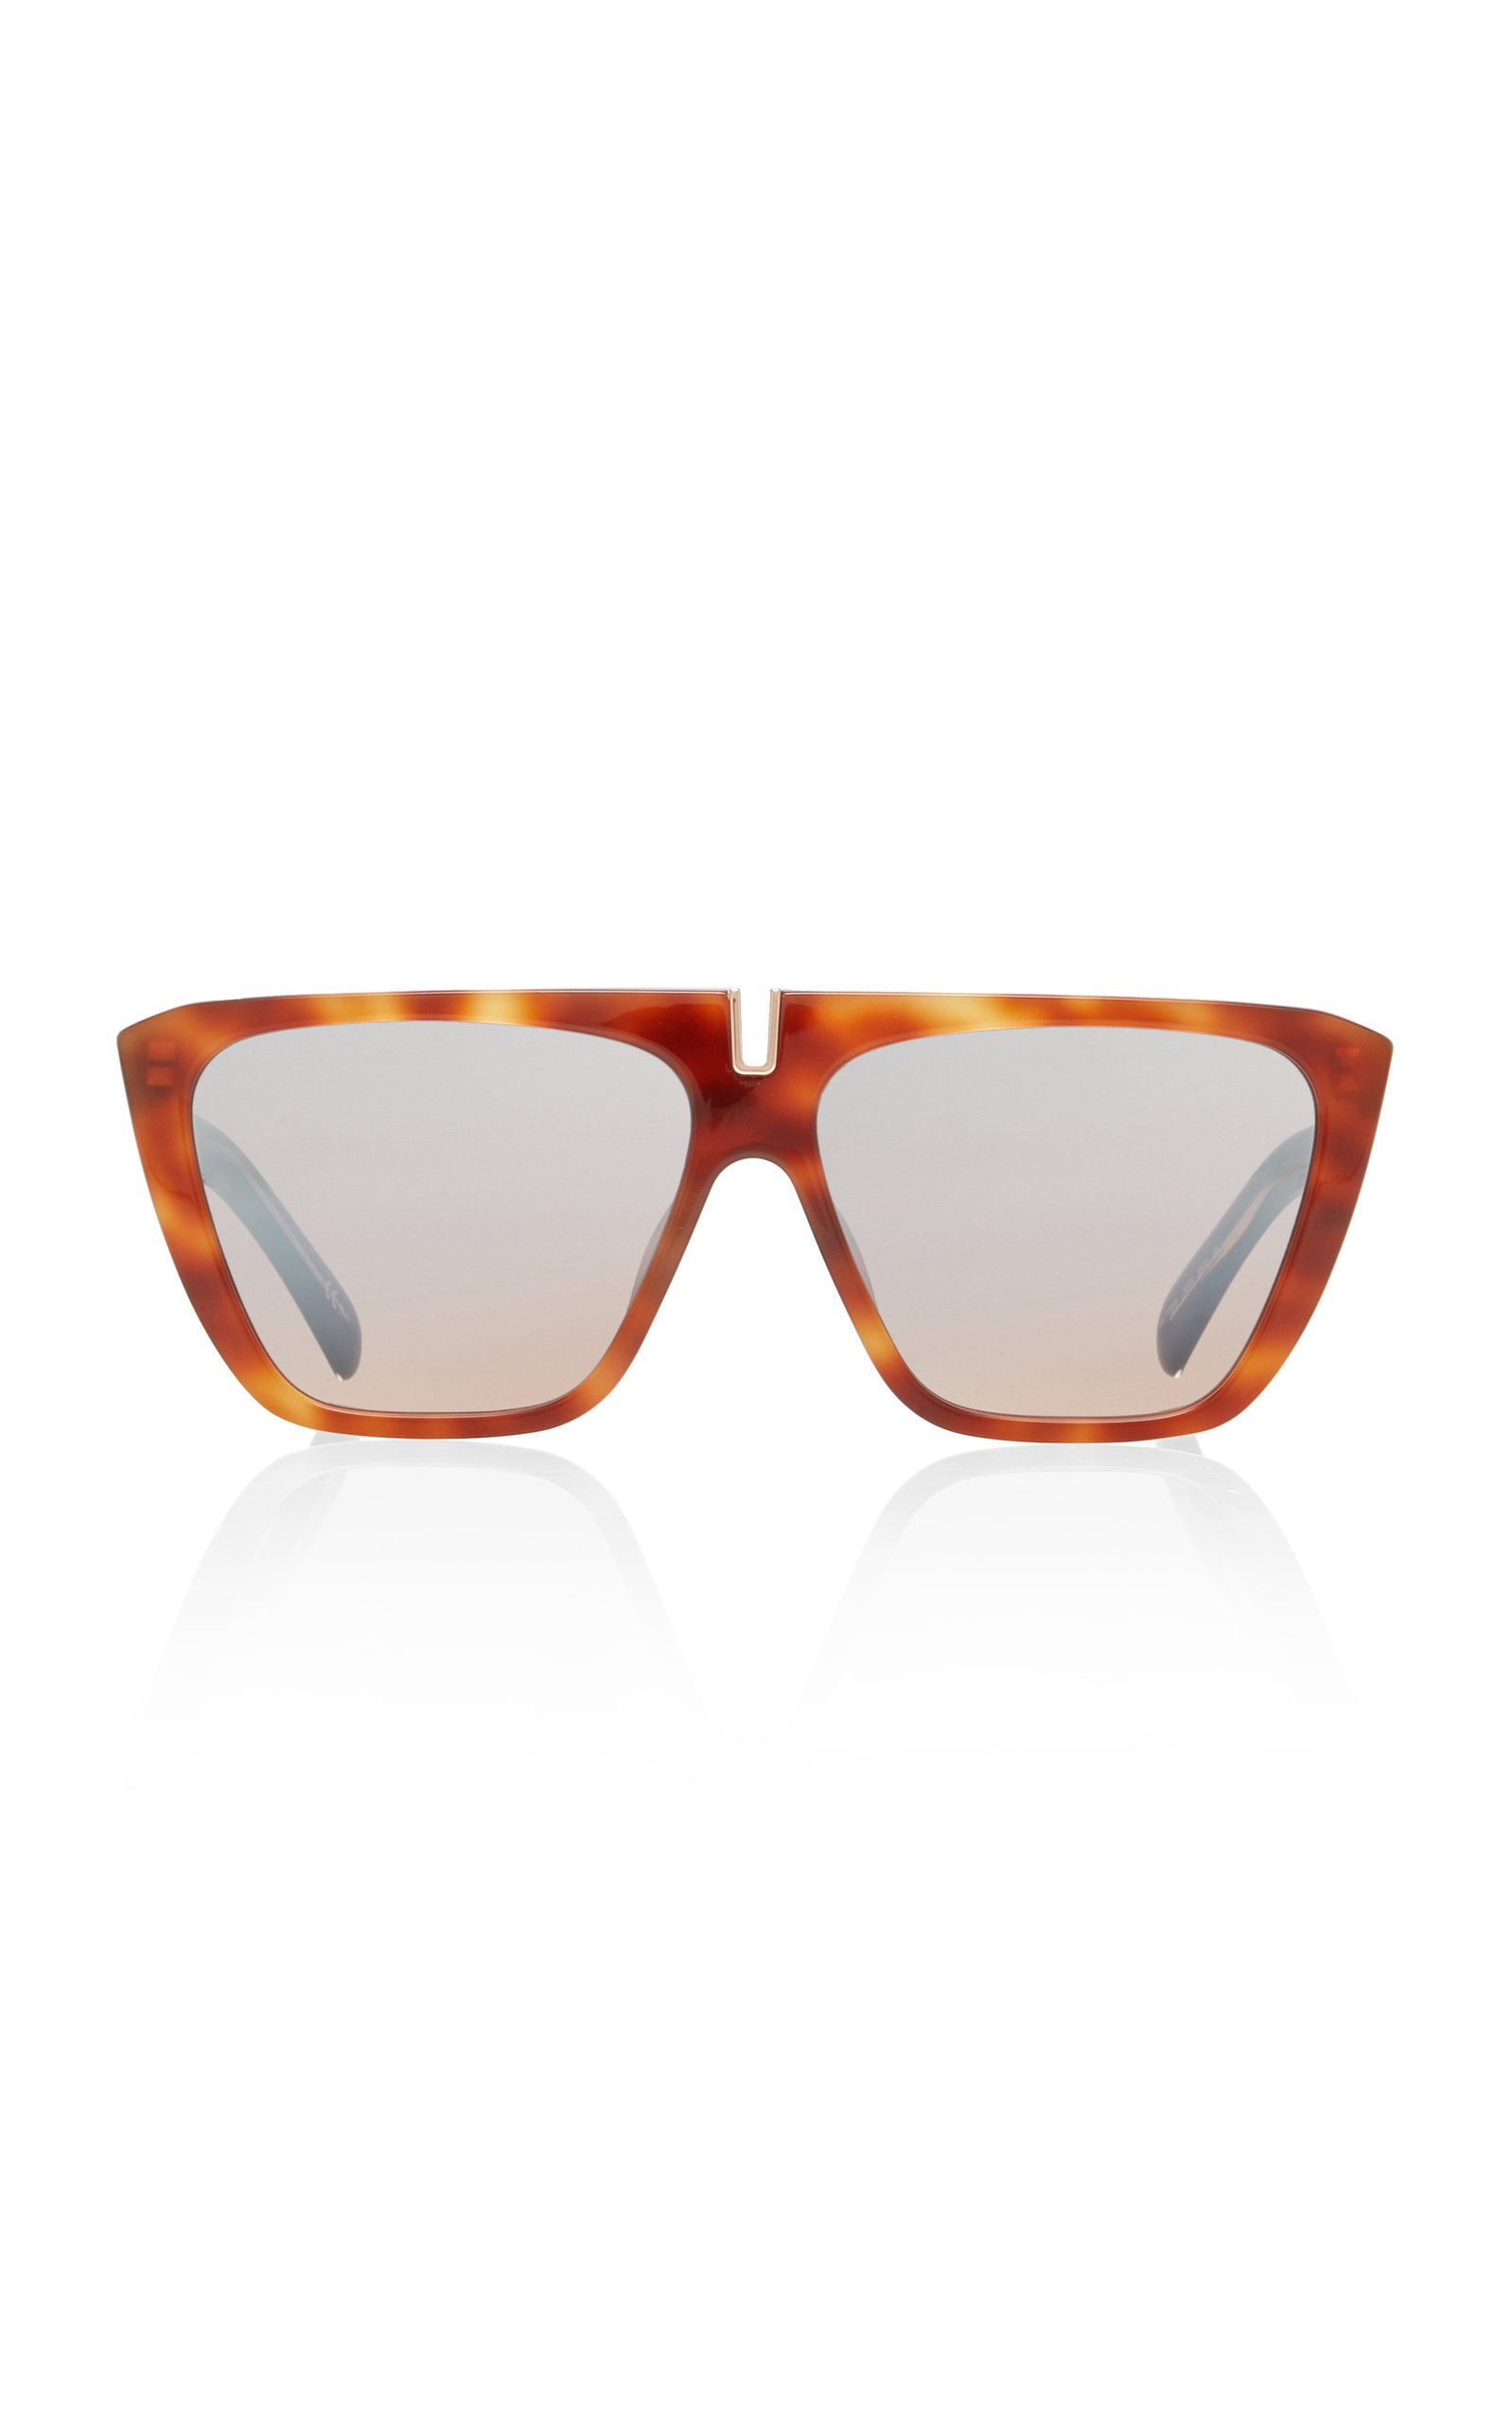 Oversized Acetate Square-Frame Sunglasses by Givenchy | Moda Operandi